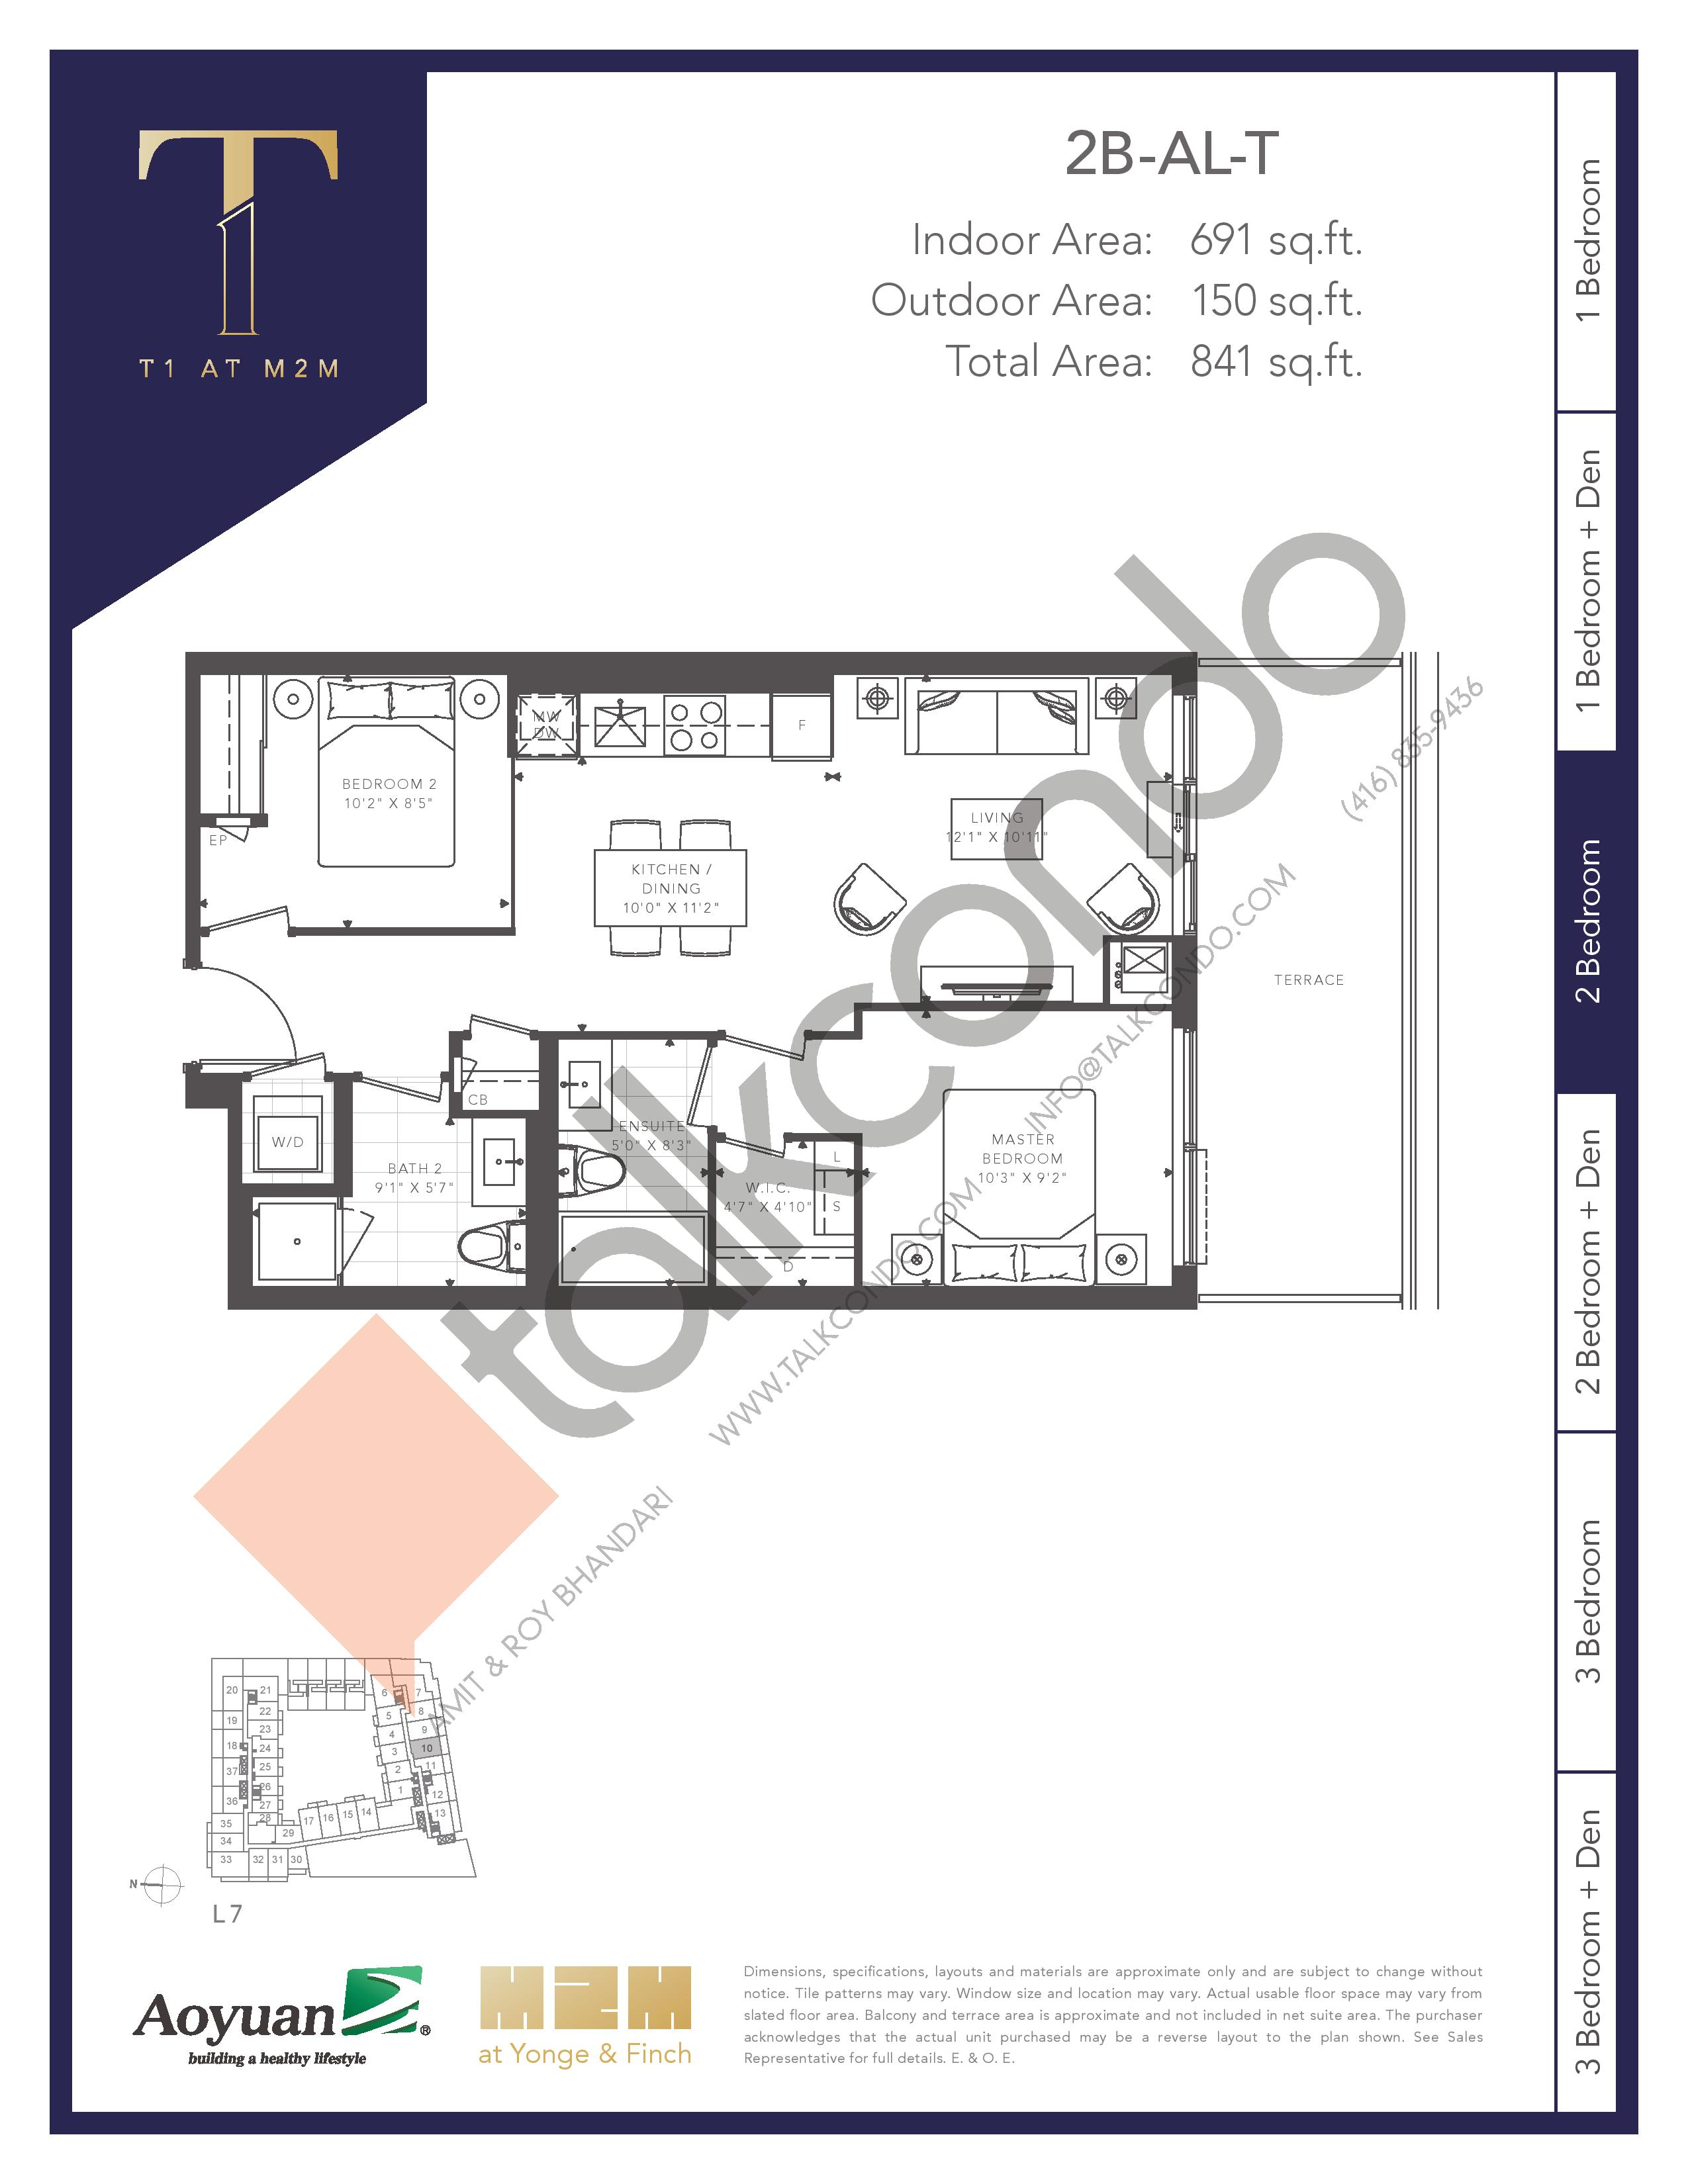 2B-AL-T (Tower) Floor Plan at T1 at M2M Condos - 691 sq.ft